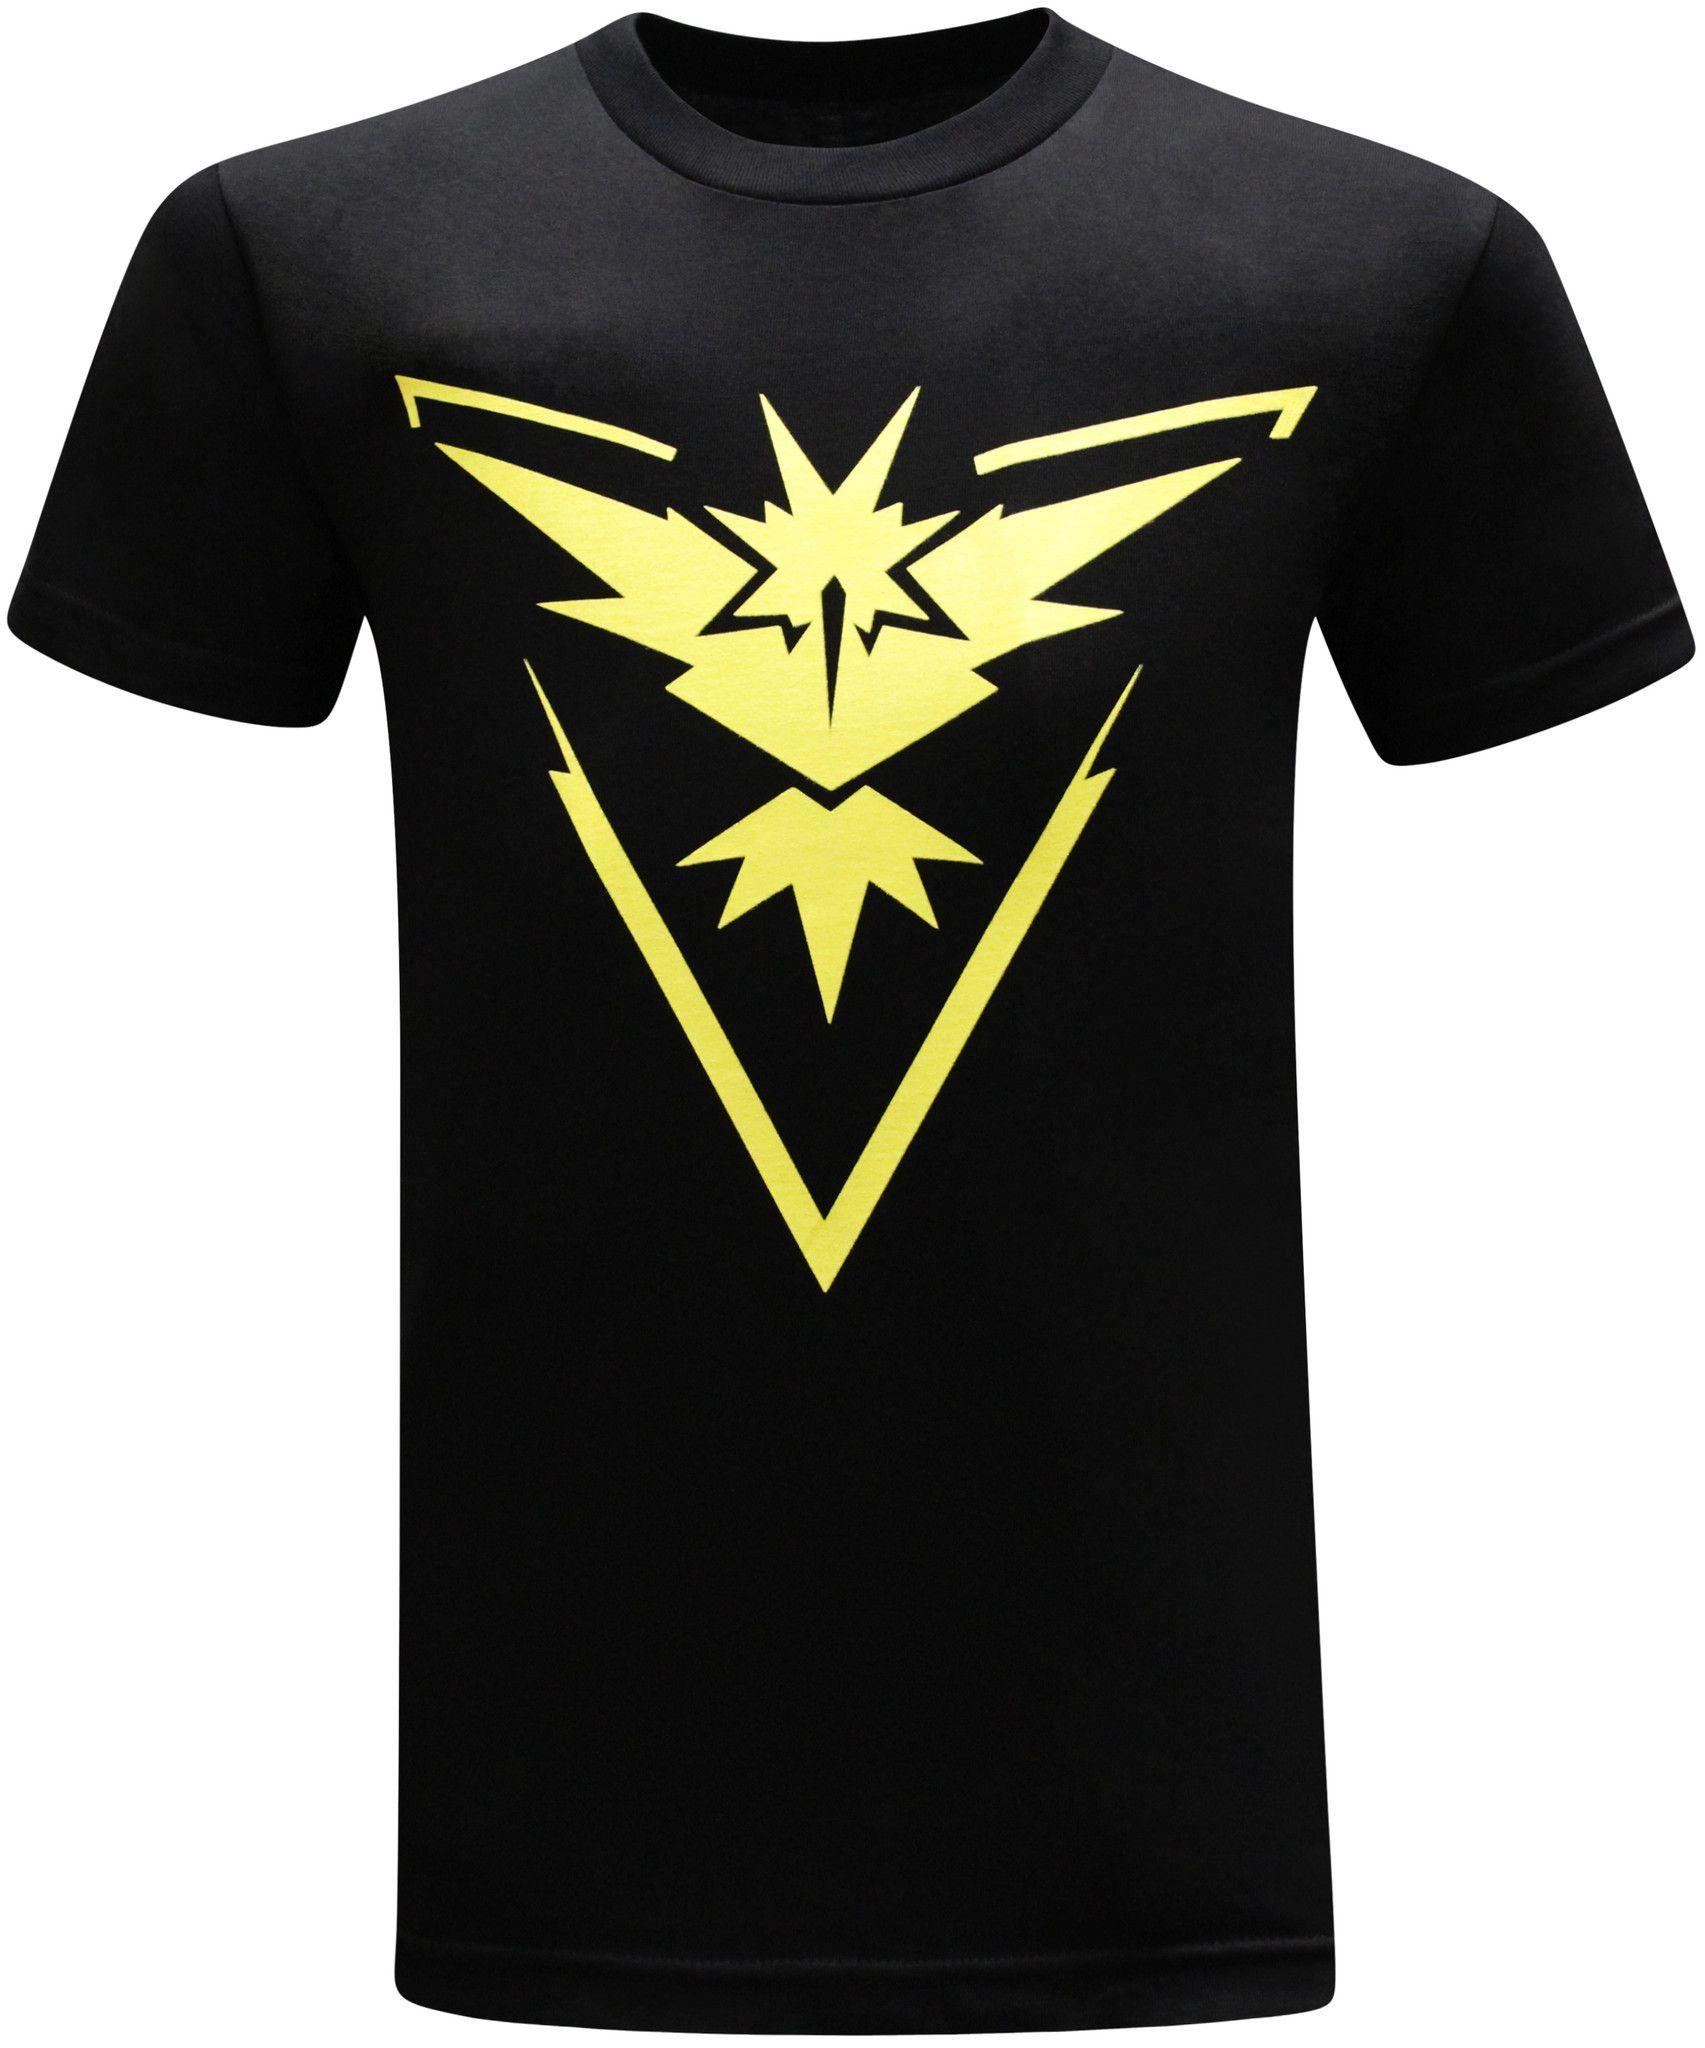 795981d26 New Arrive Casual Tees Women/Men Fashio Clothing Jersey Summer 3D Peinted  Tops Pokemon Go Team Instinct T-Shirt Outfits | Team Instinct